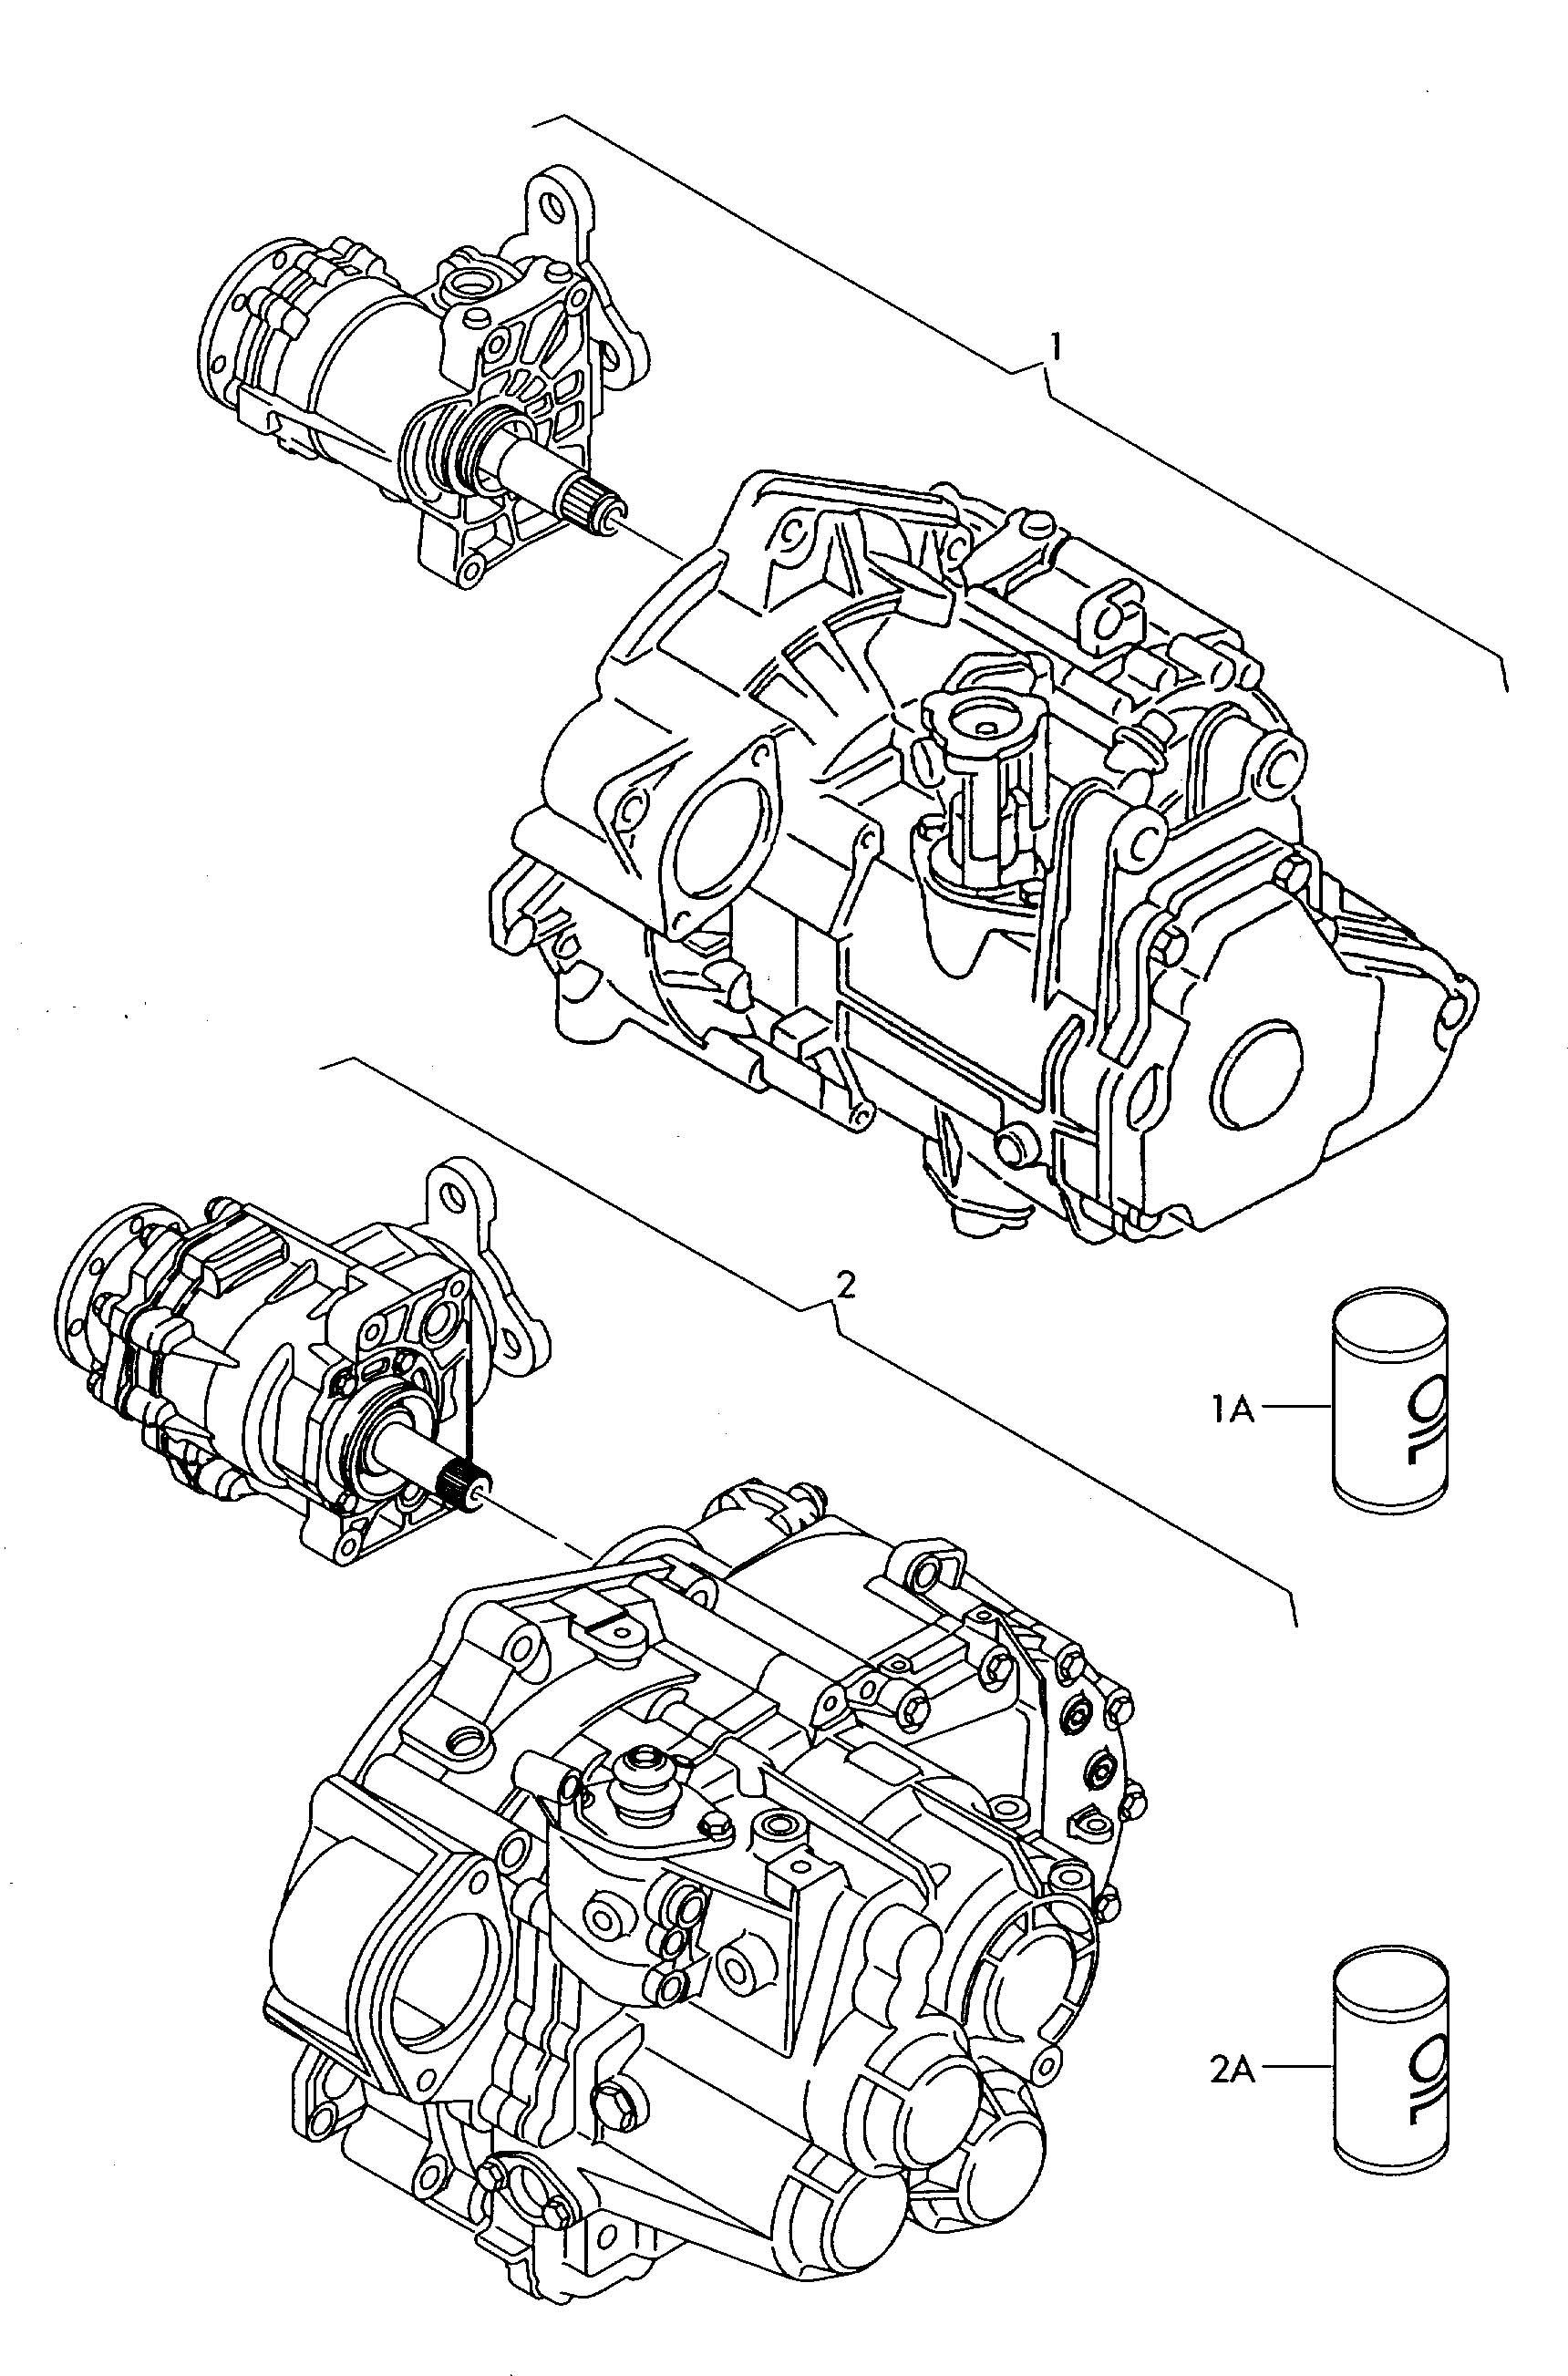 Volkswagen Golf 6 speed manual transmission for 4 wheel drive